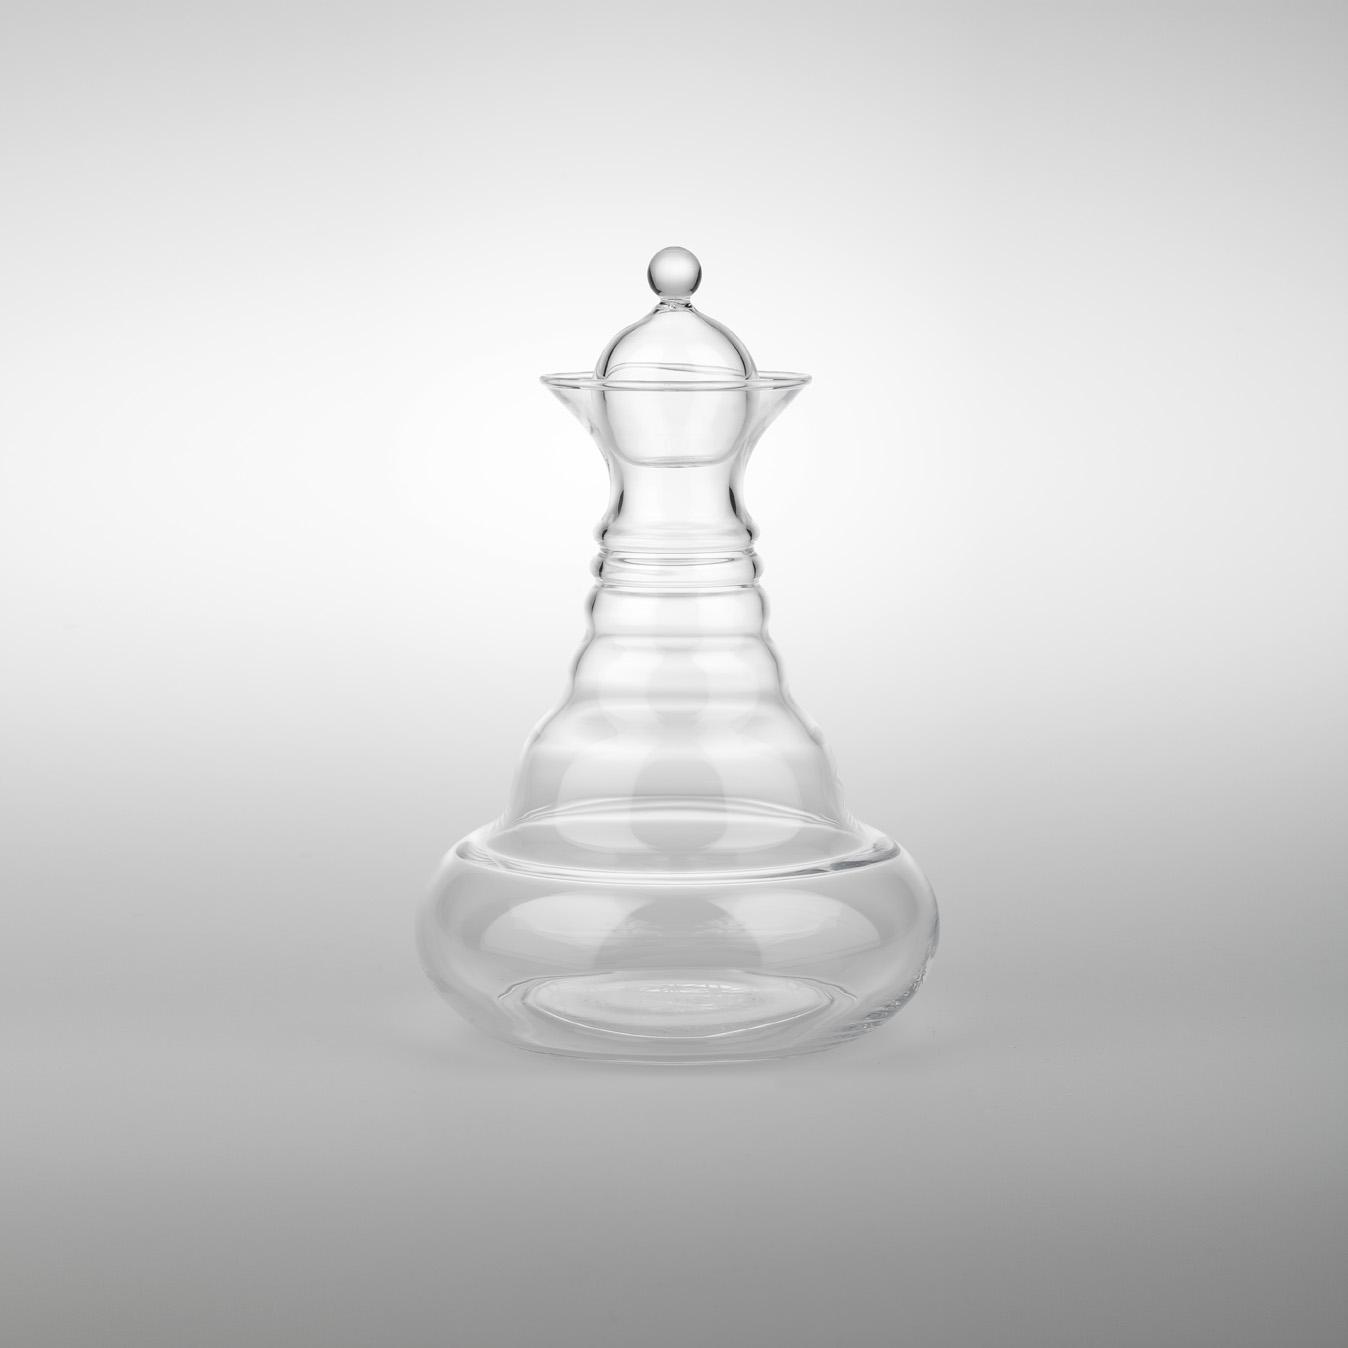 "Karafa Alladin White 1,3 litru - ""Květ života"" Revitalizační karafa na vodu (Karafa Kvet zivota - s bílým symbolem ""Květ života"" Revitalizační karafa na vodu)"